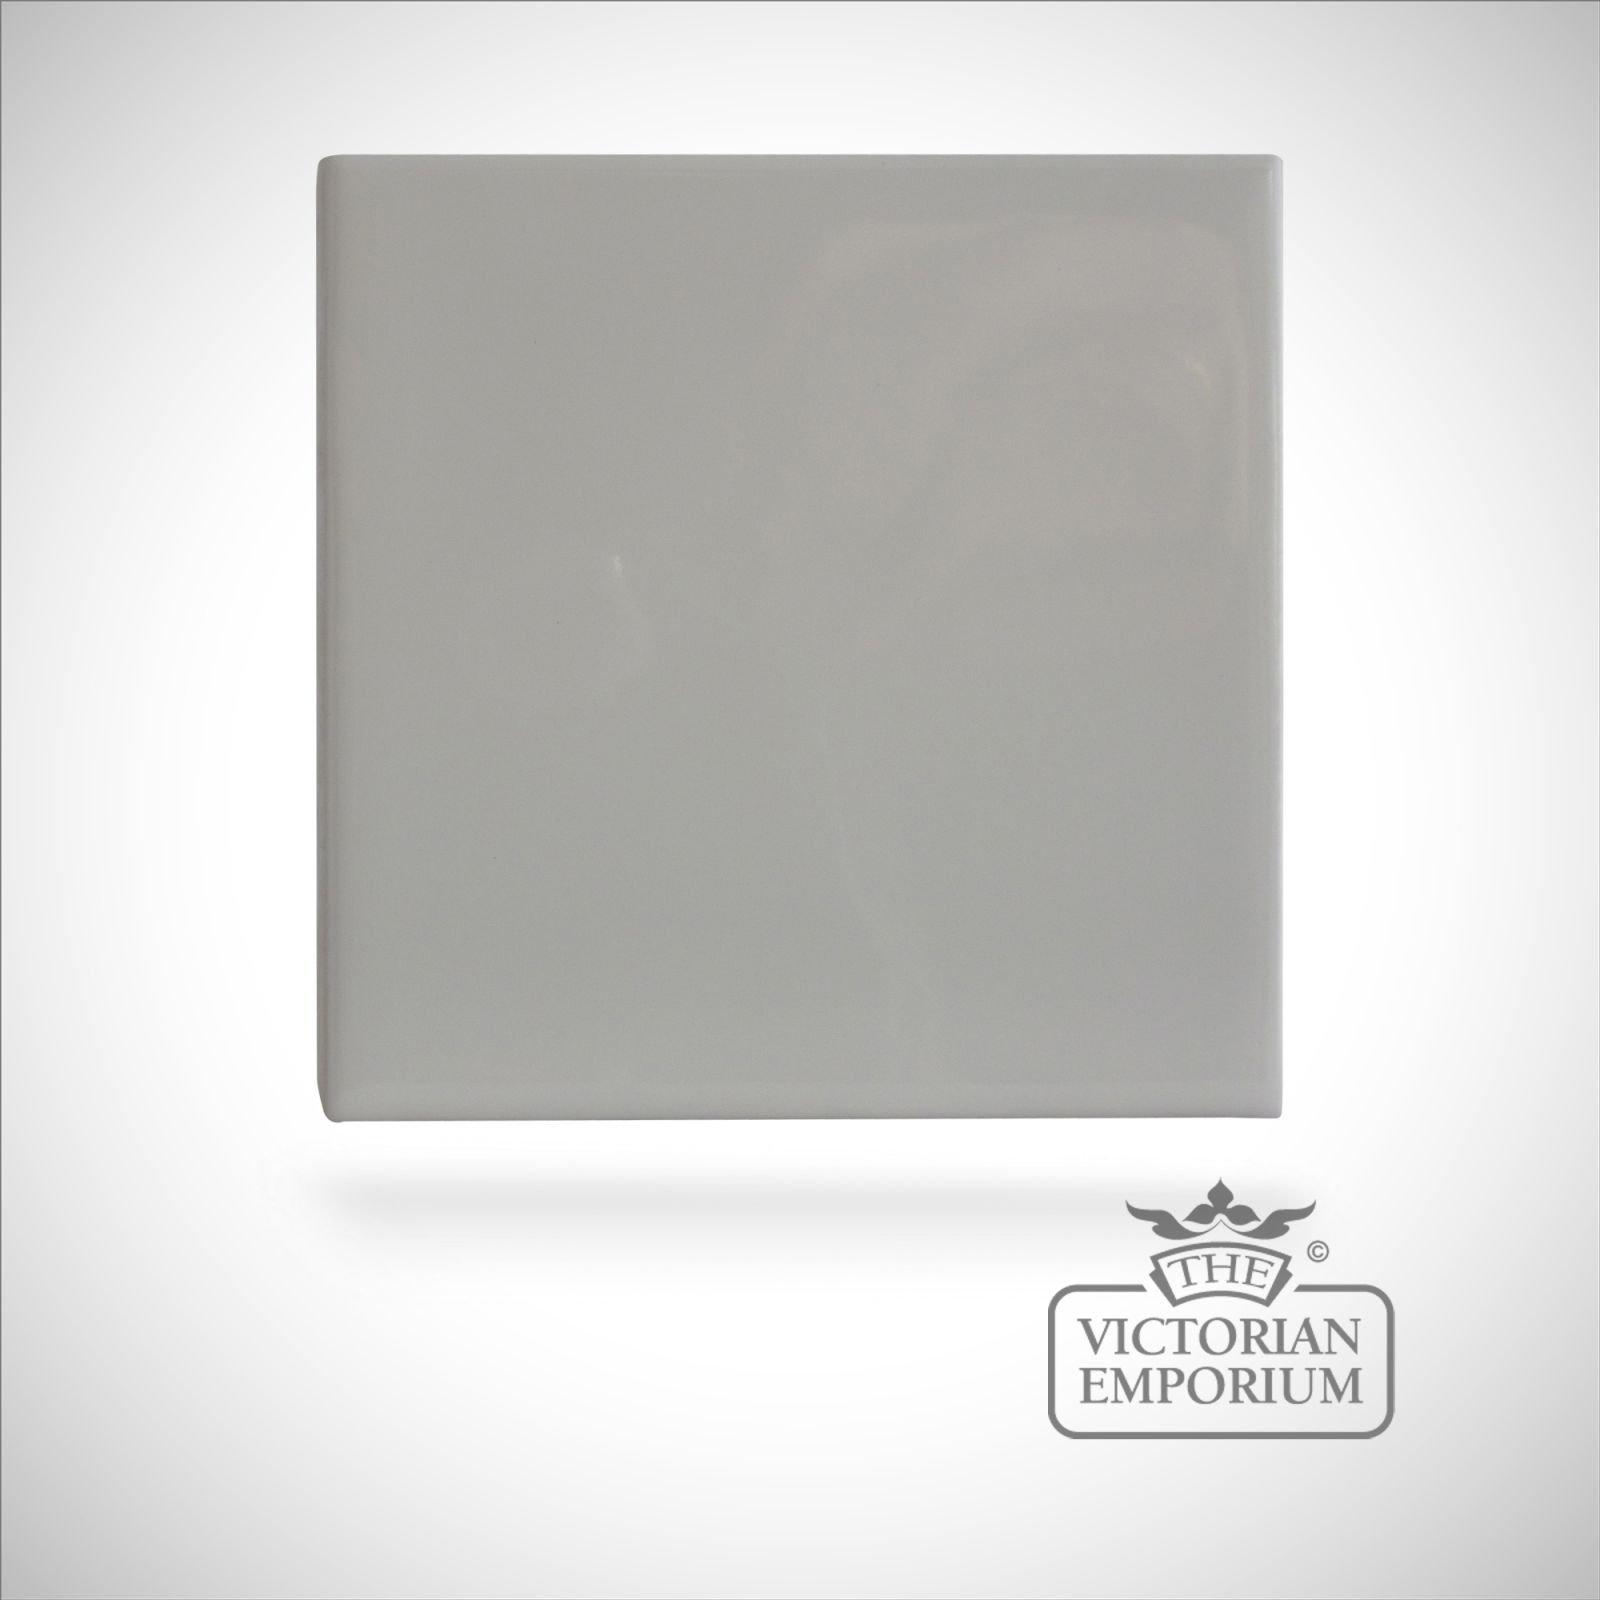 Neutral coloured tiles - White - 110x110mm